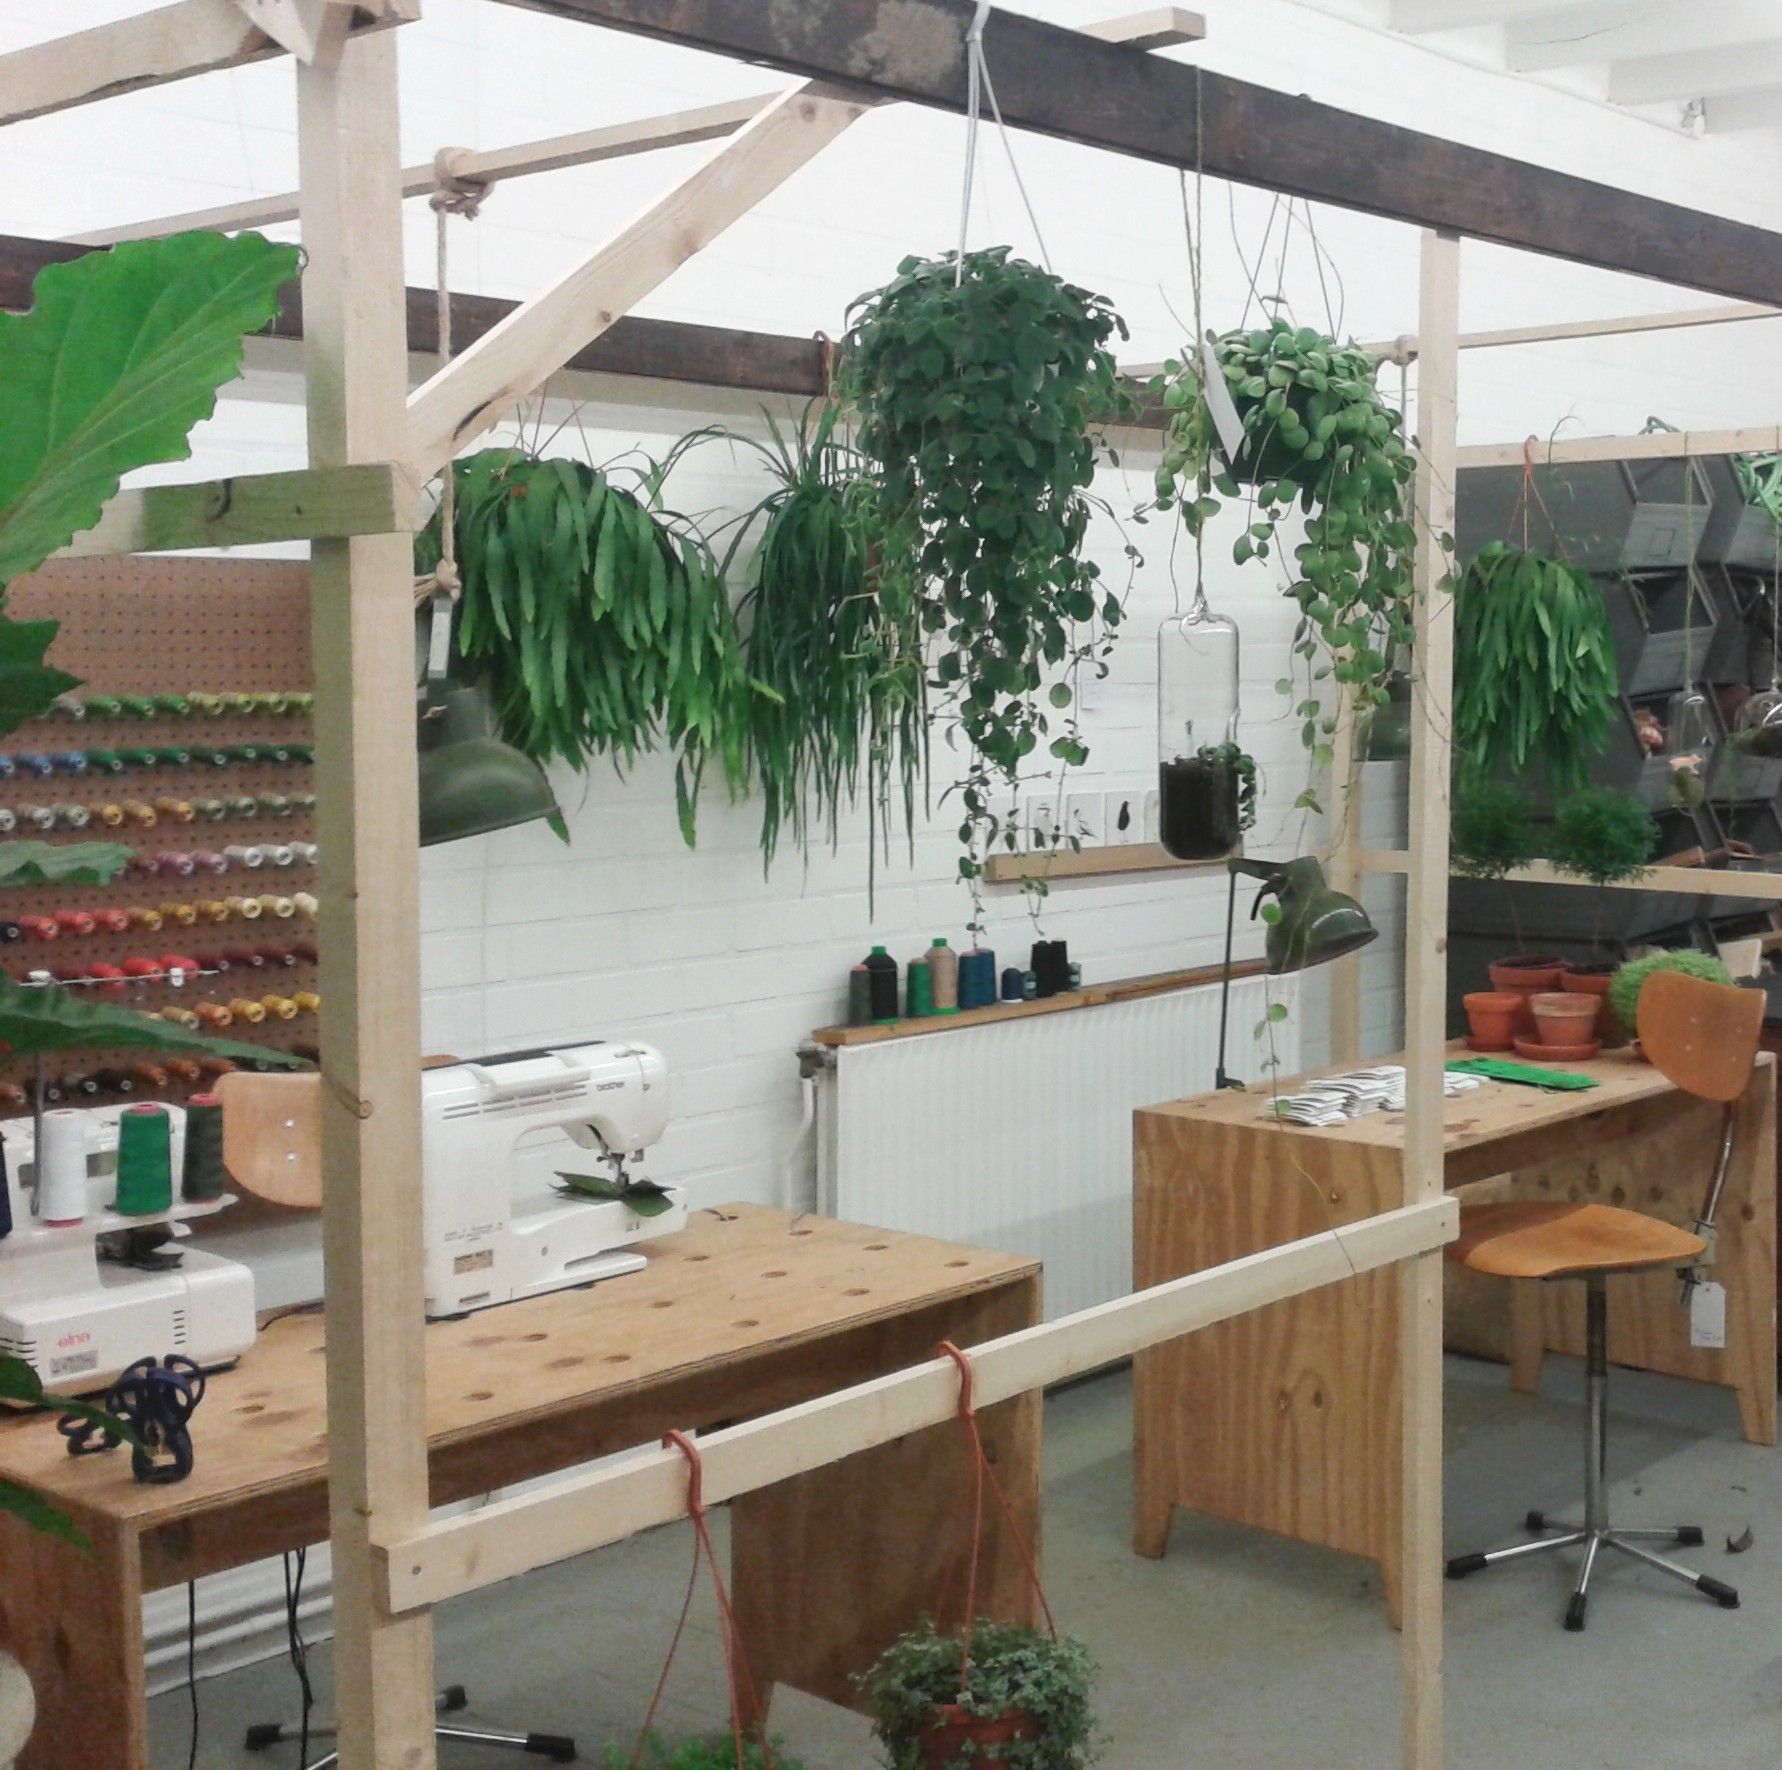 Plantaardig wundervolles Geschäft in Middelburg NL